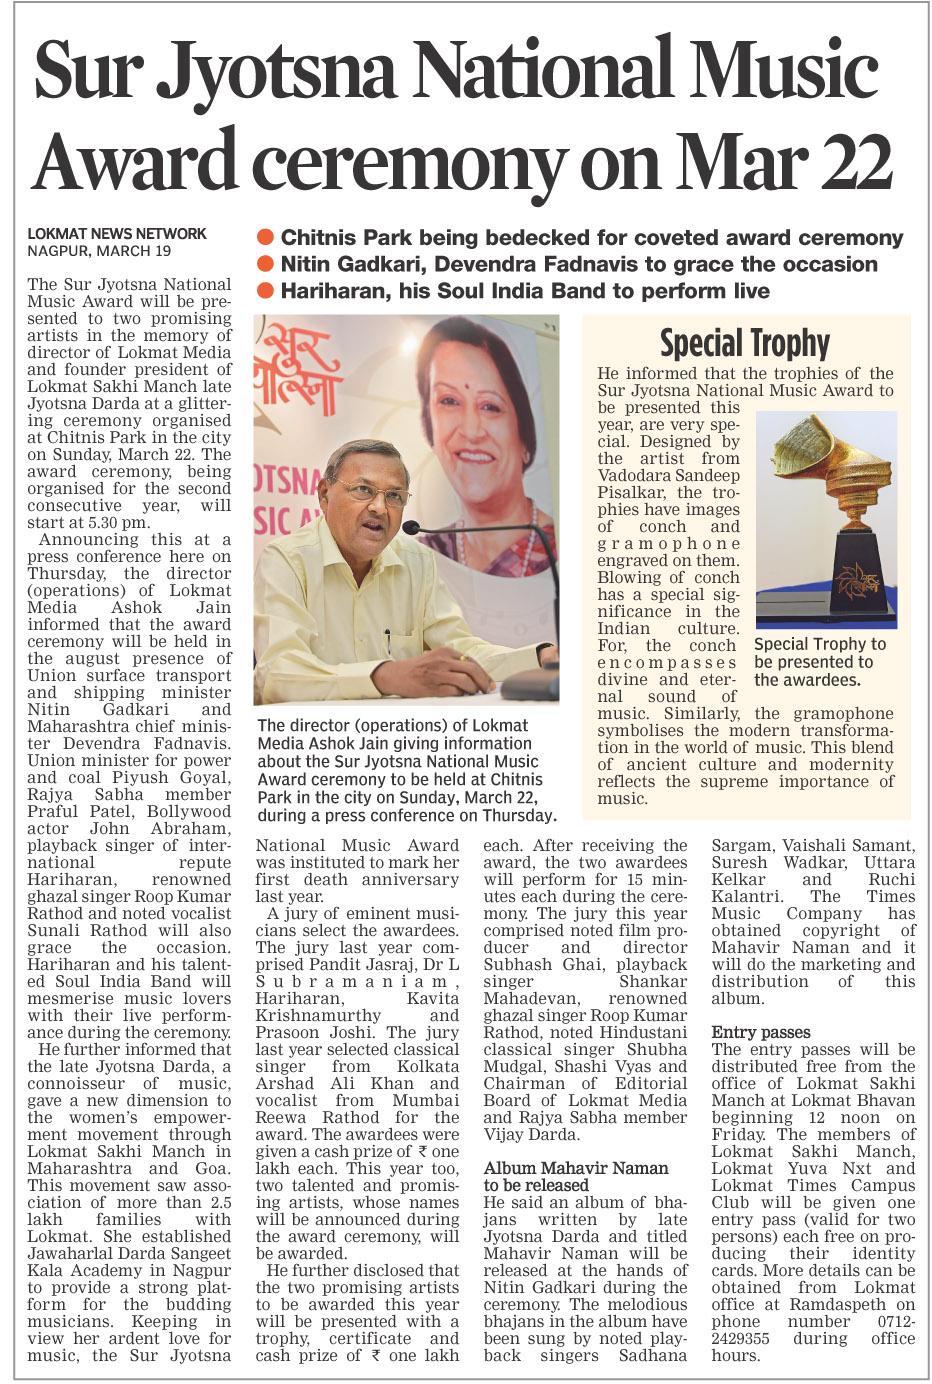 Sur Jyotsna National Music Award ceremony on Mar 22